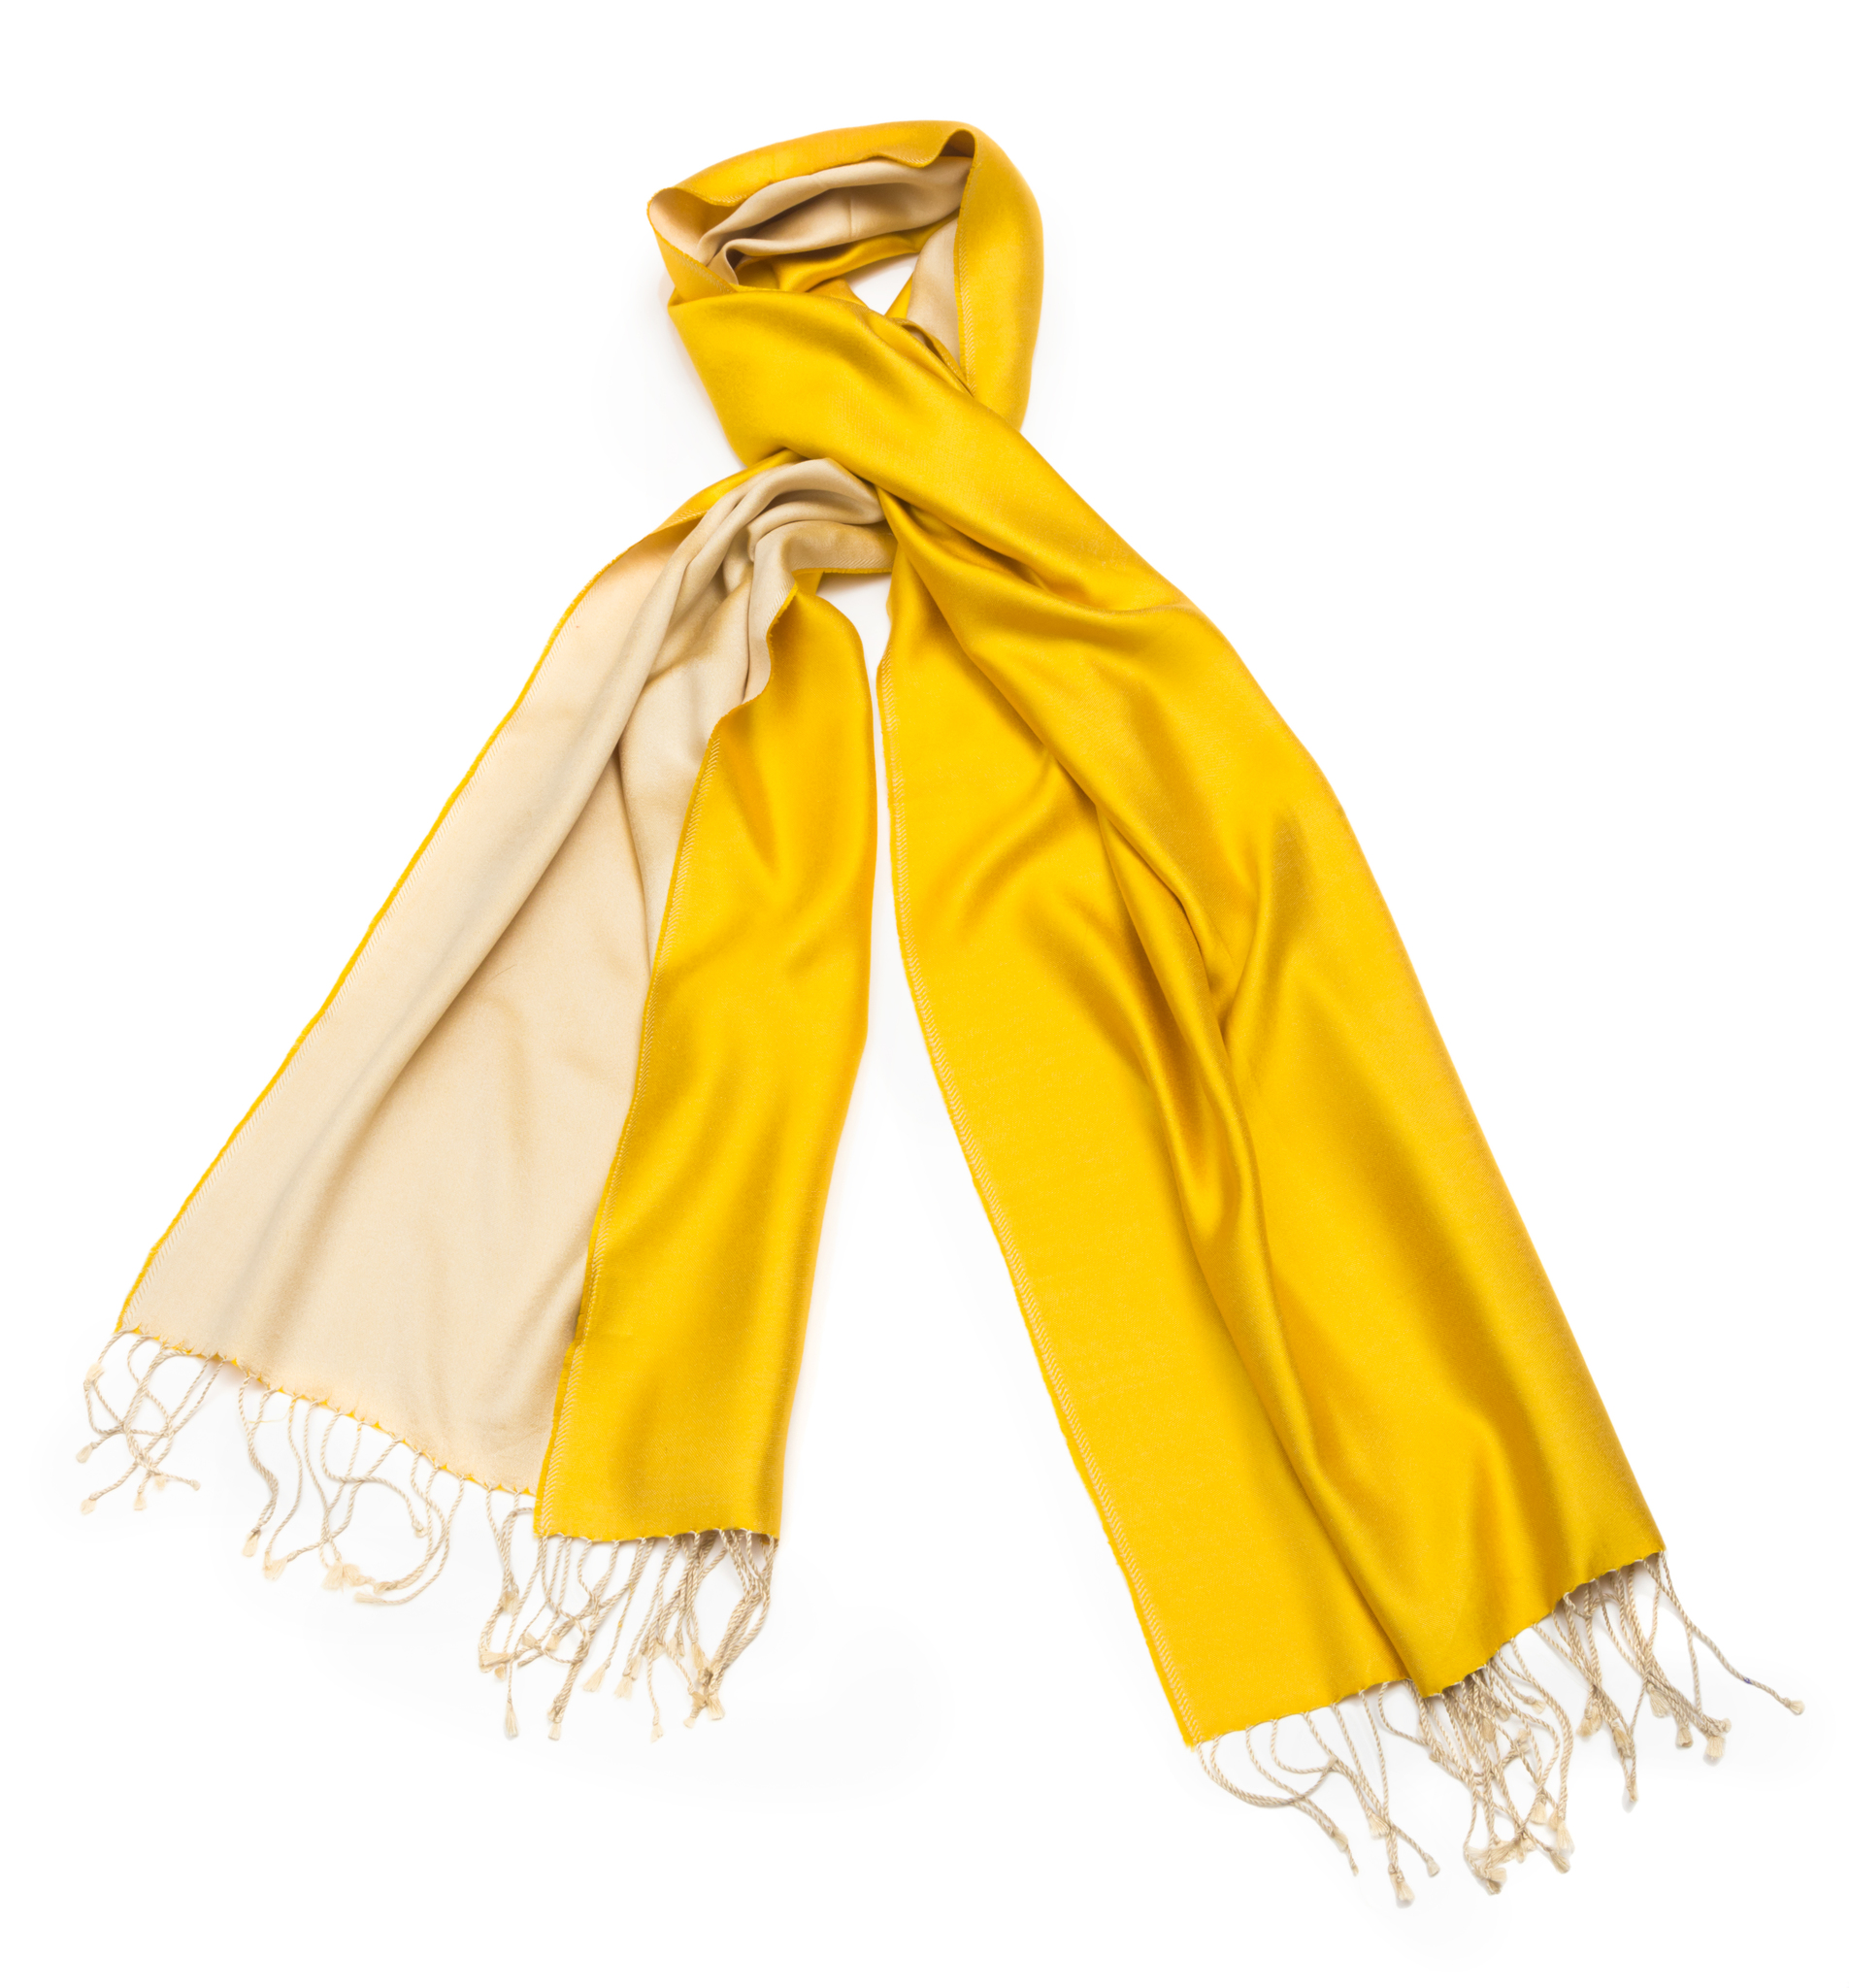 Шарфы Плед-шарф 50х180 AM Paris Paraty желтый pled-sharf-50h180-am-paris-paraty-zheltyy-frantsiya.jpg